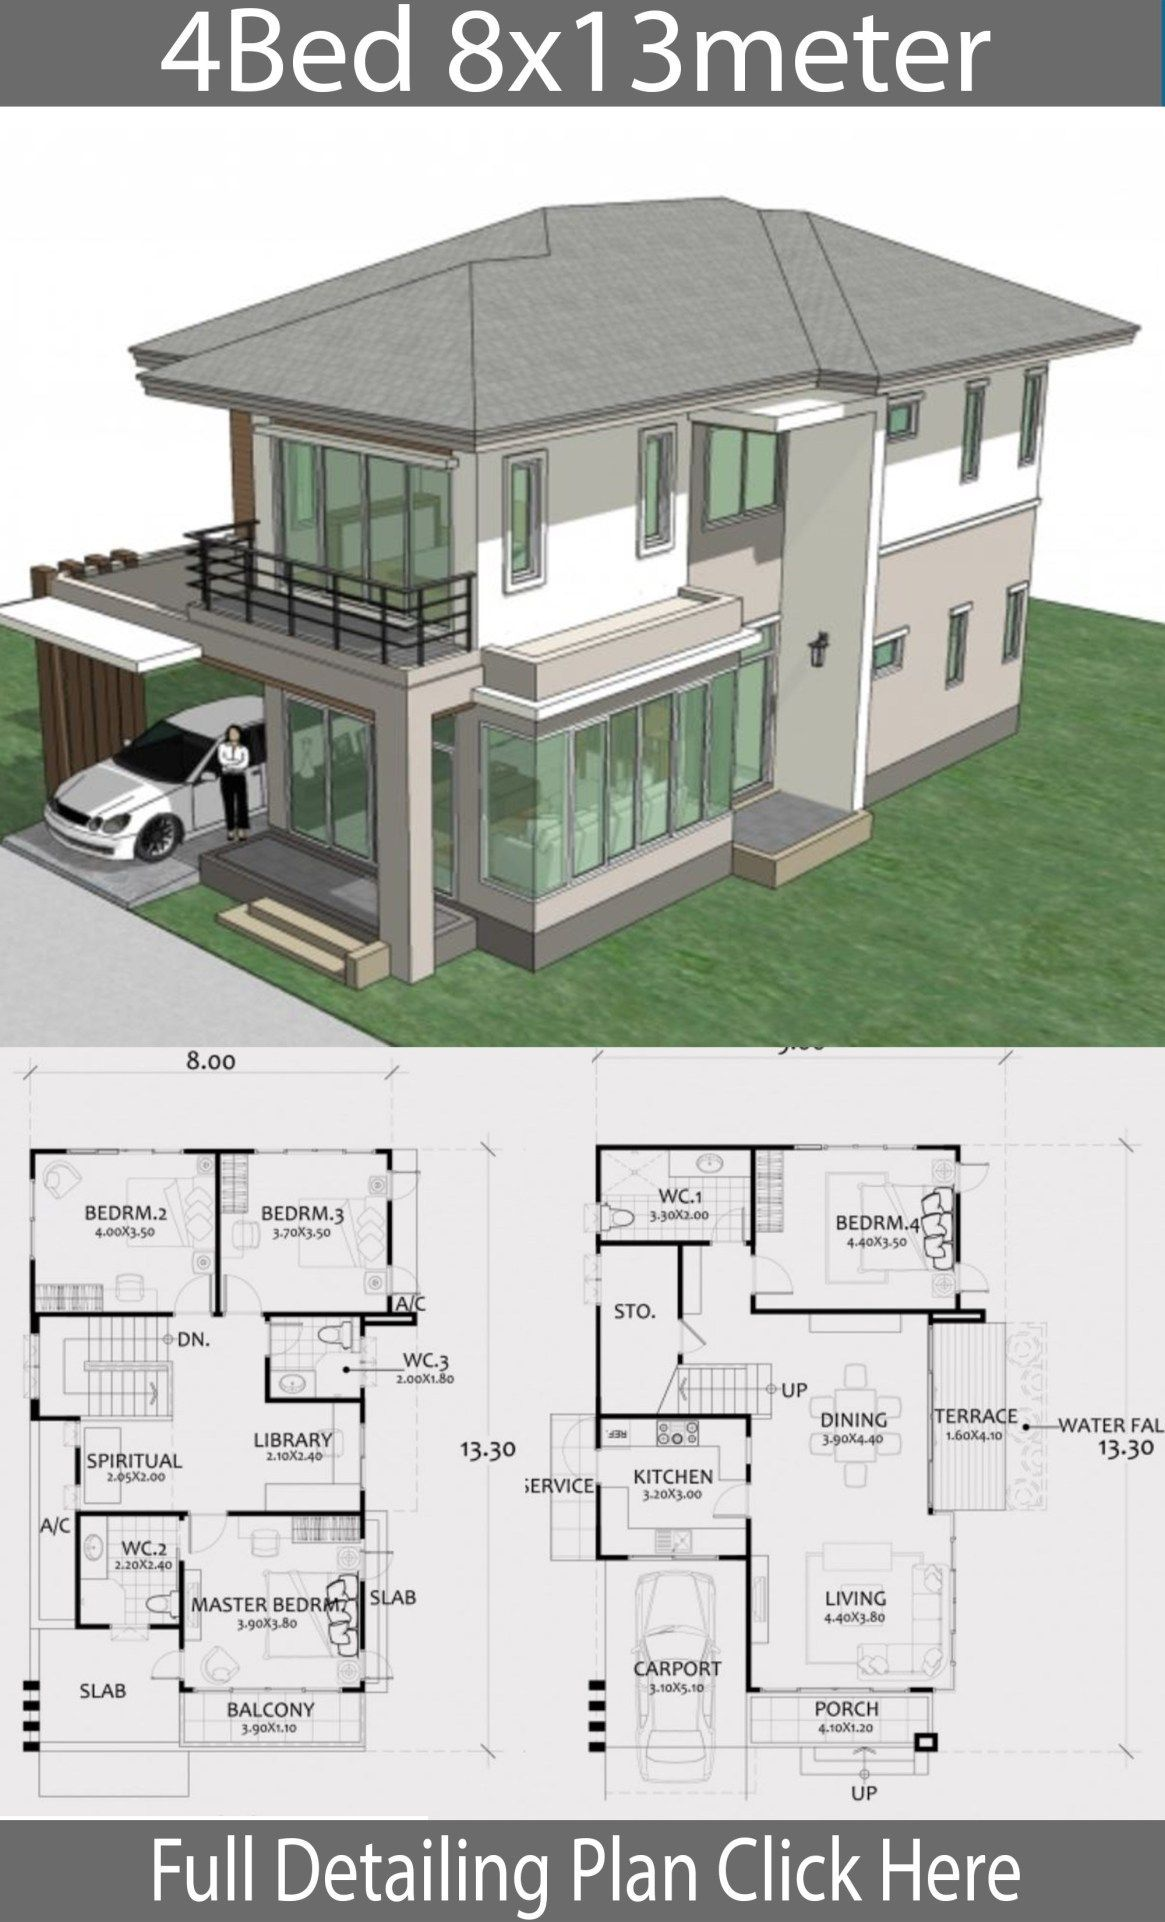 Home Design Plan 8x13m With 4 Bedrooms Home Design With Plansearch Homedesigns Atriums Projetos De Casas Projectos De Casas Arquitetura Casas